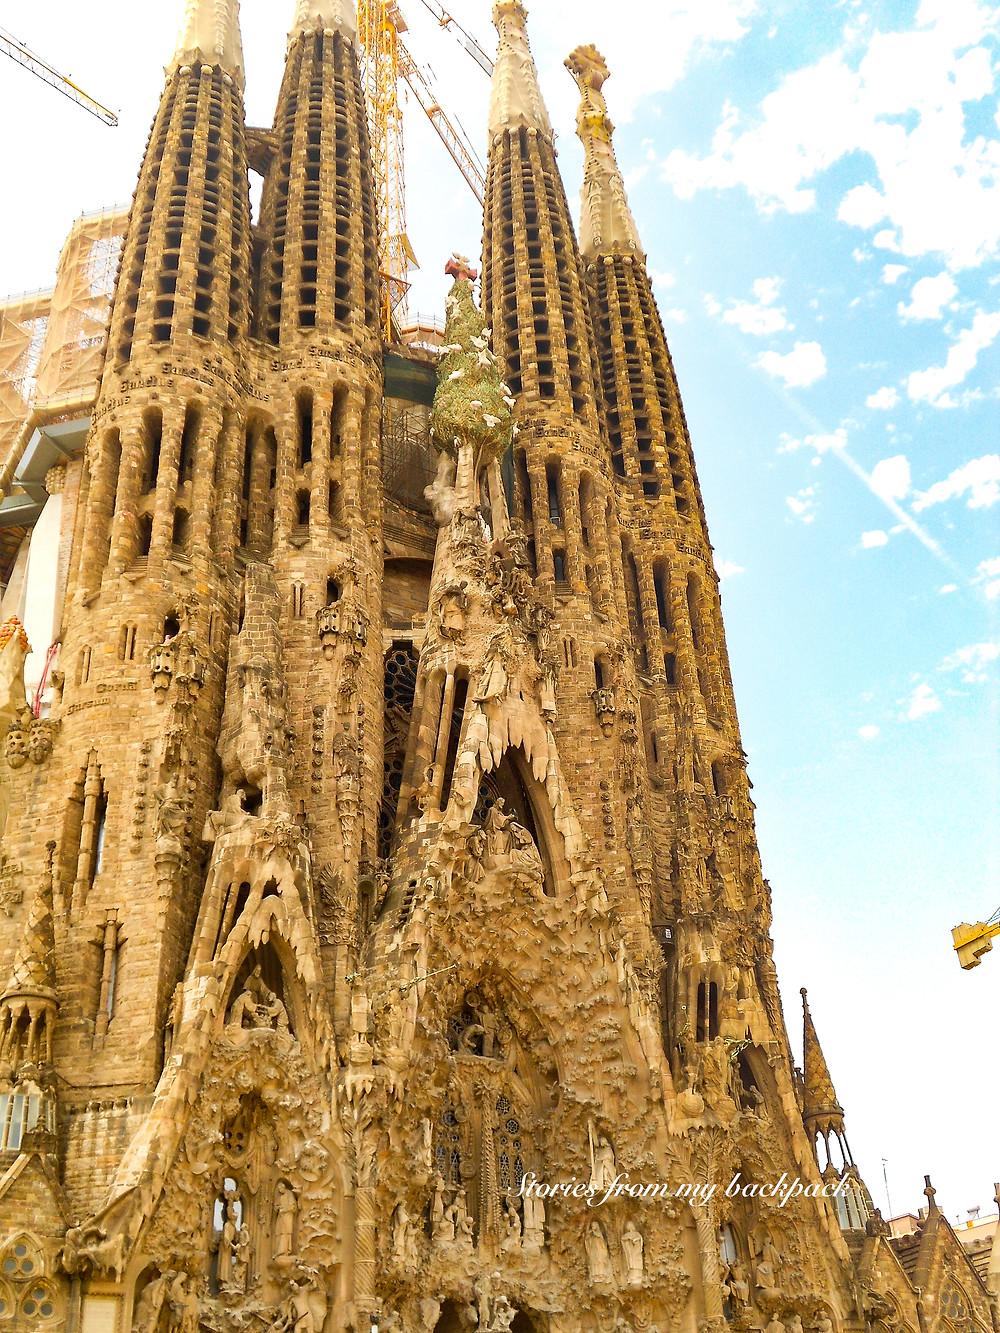 la Sagrada Familia, Gaudi's most famous work, Gaudi's unfinished work, Gaudi on a budget, Barcelona card, Barcelona city pass